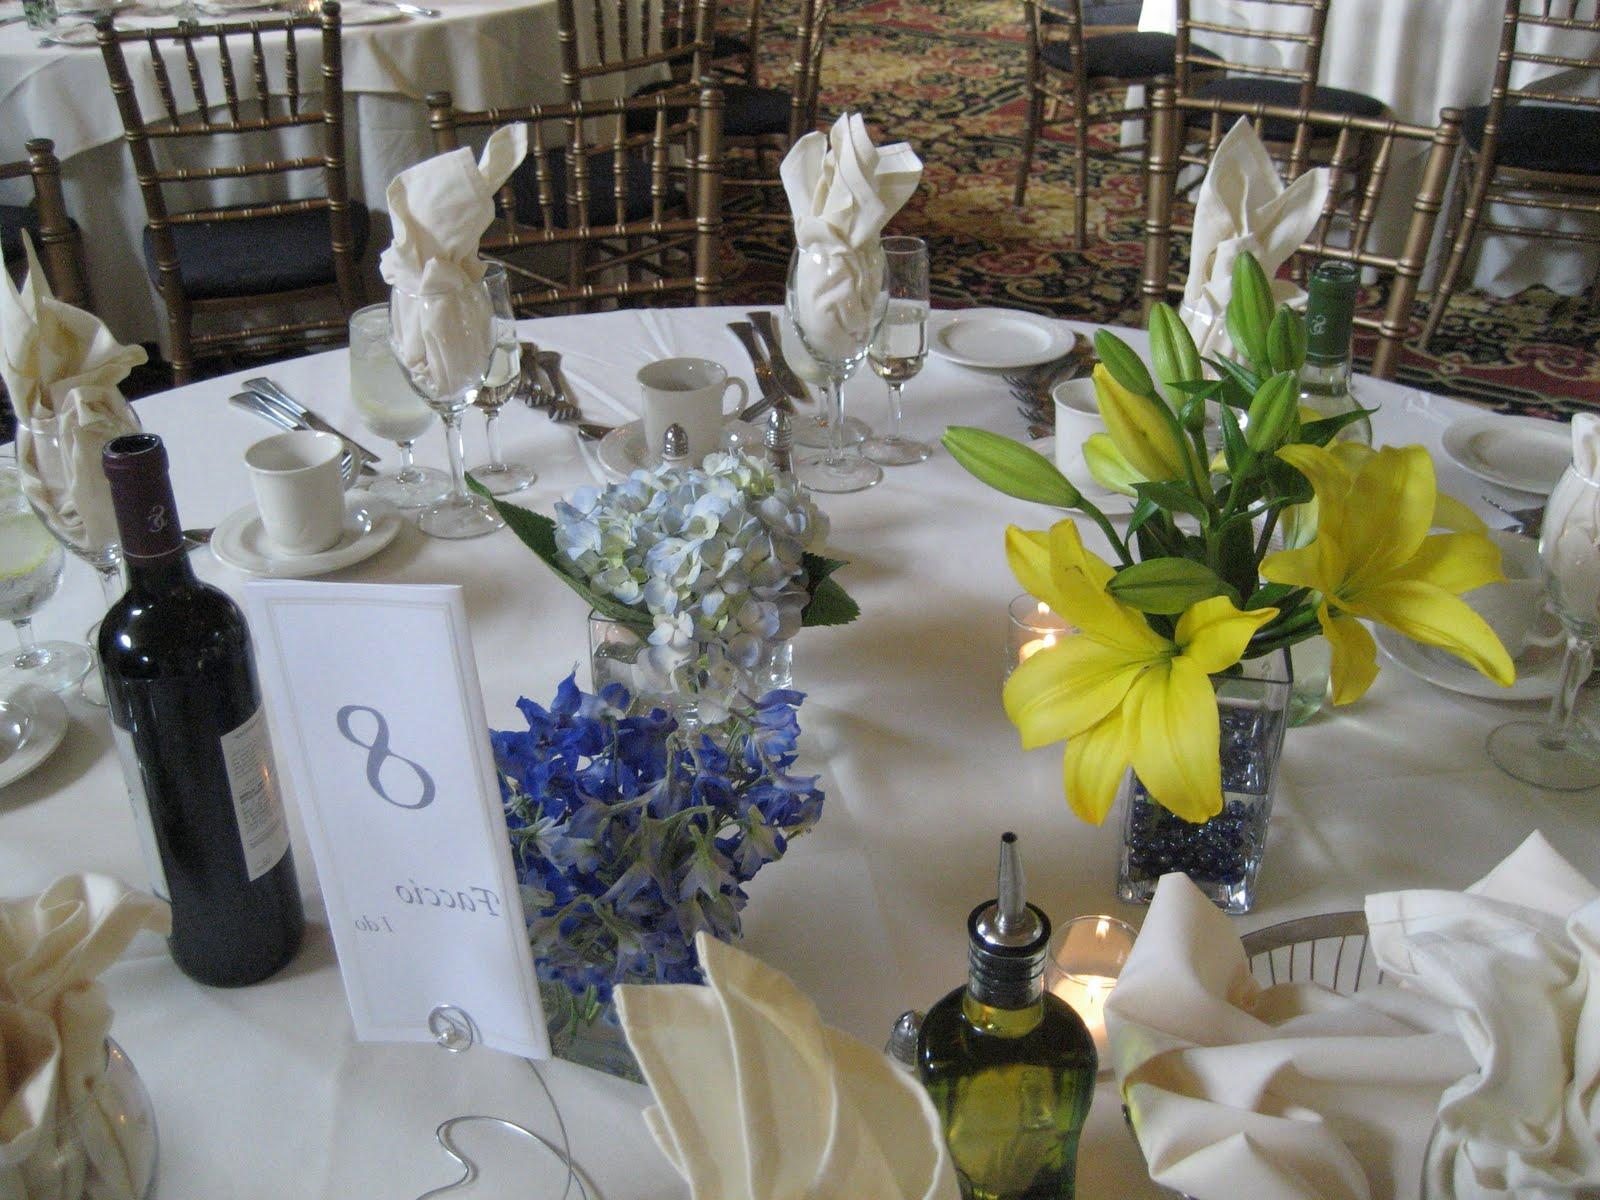 Jevon S Blog Cricut Wedding Ideas Place